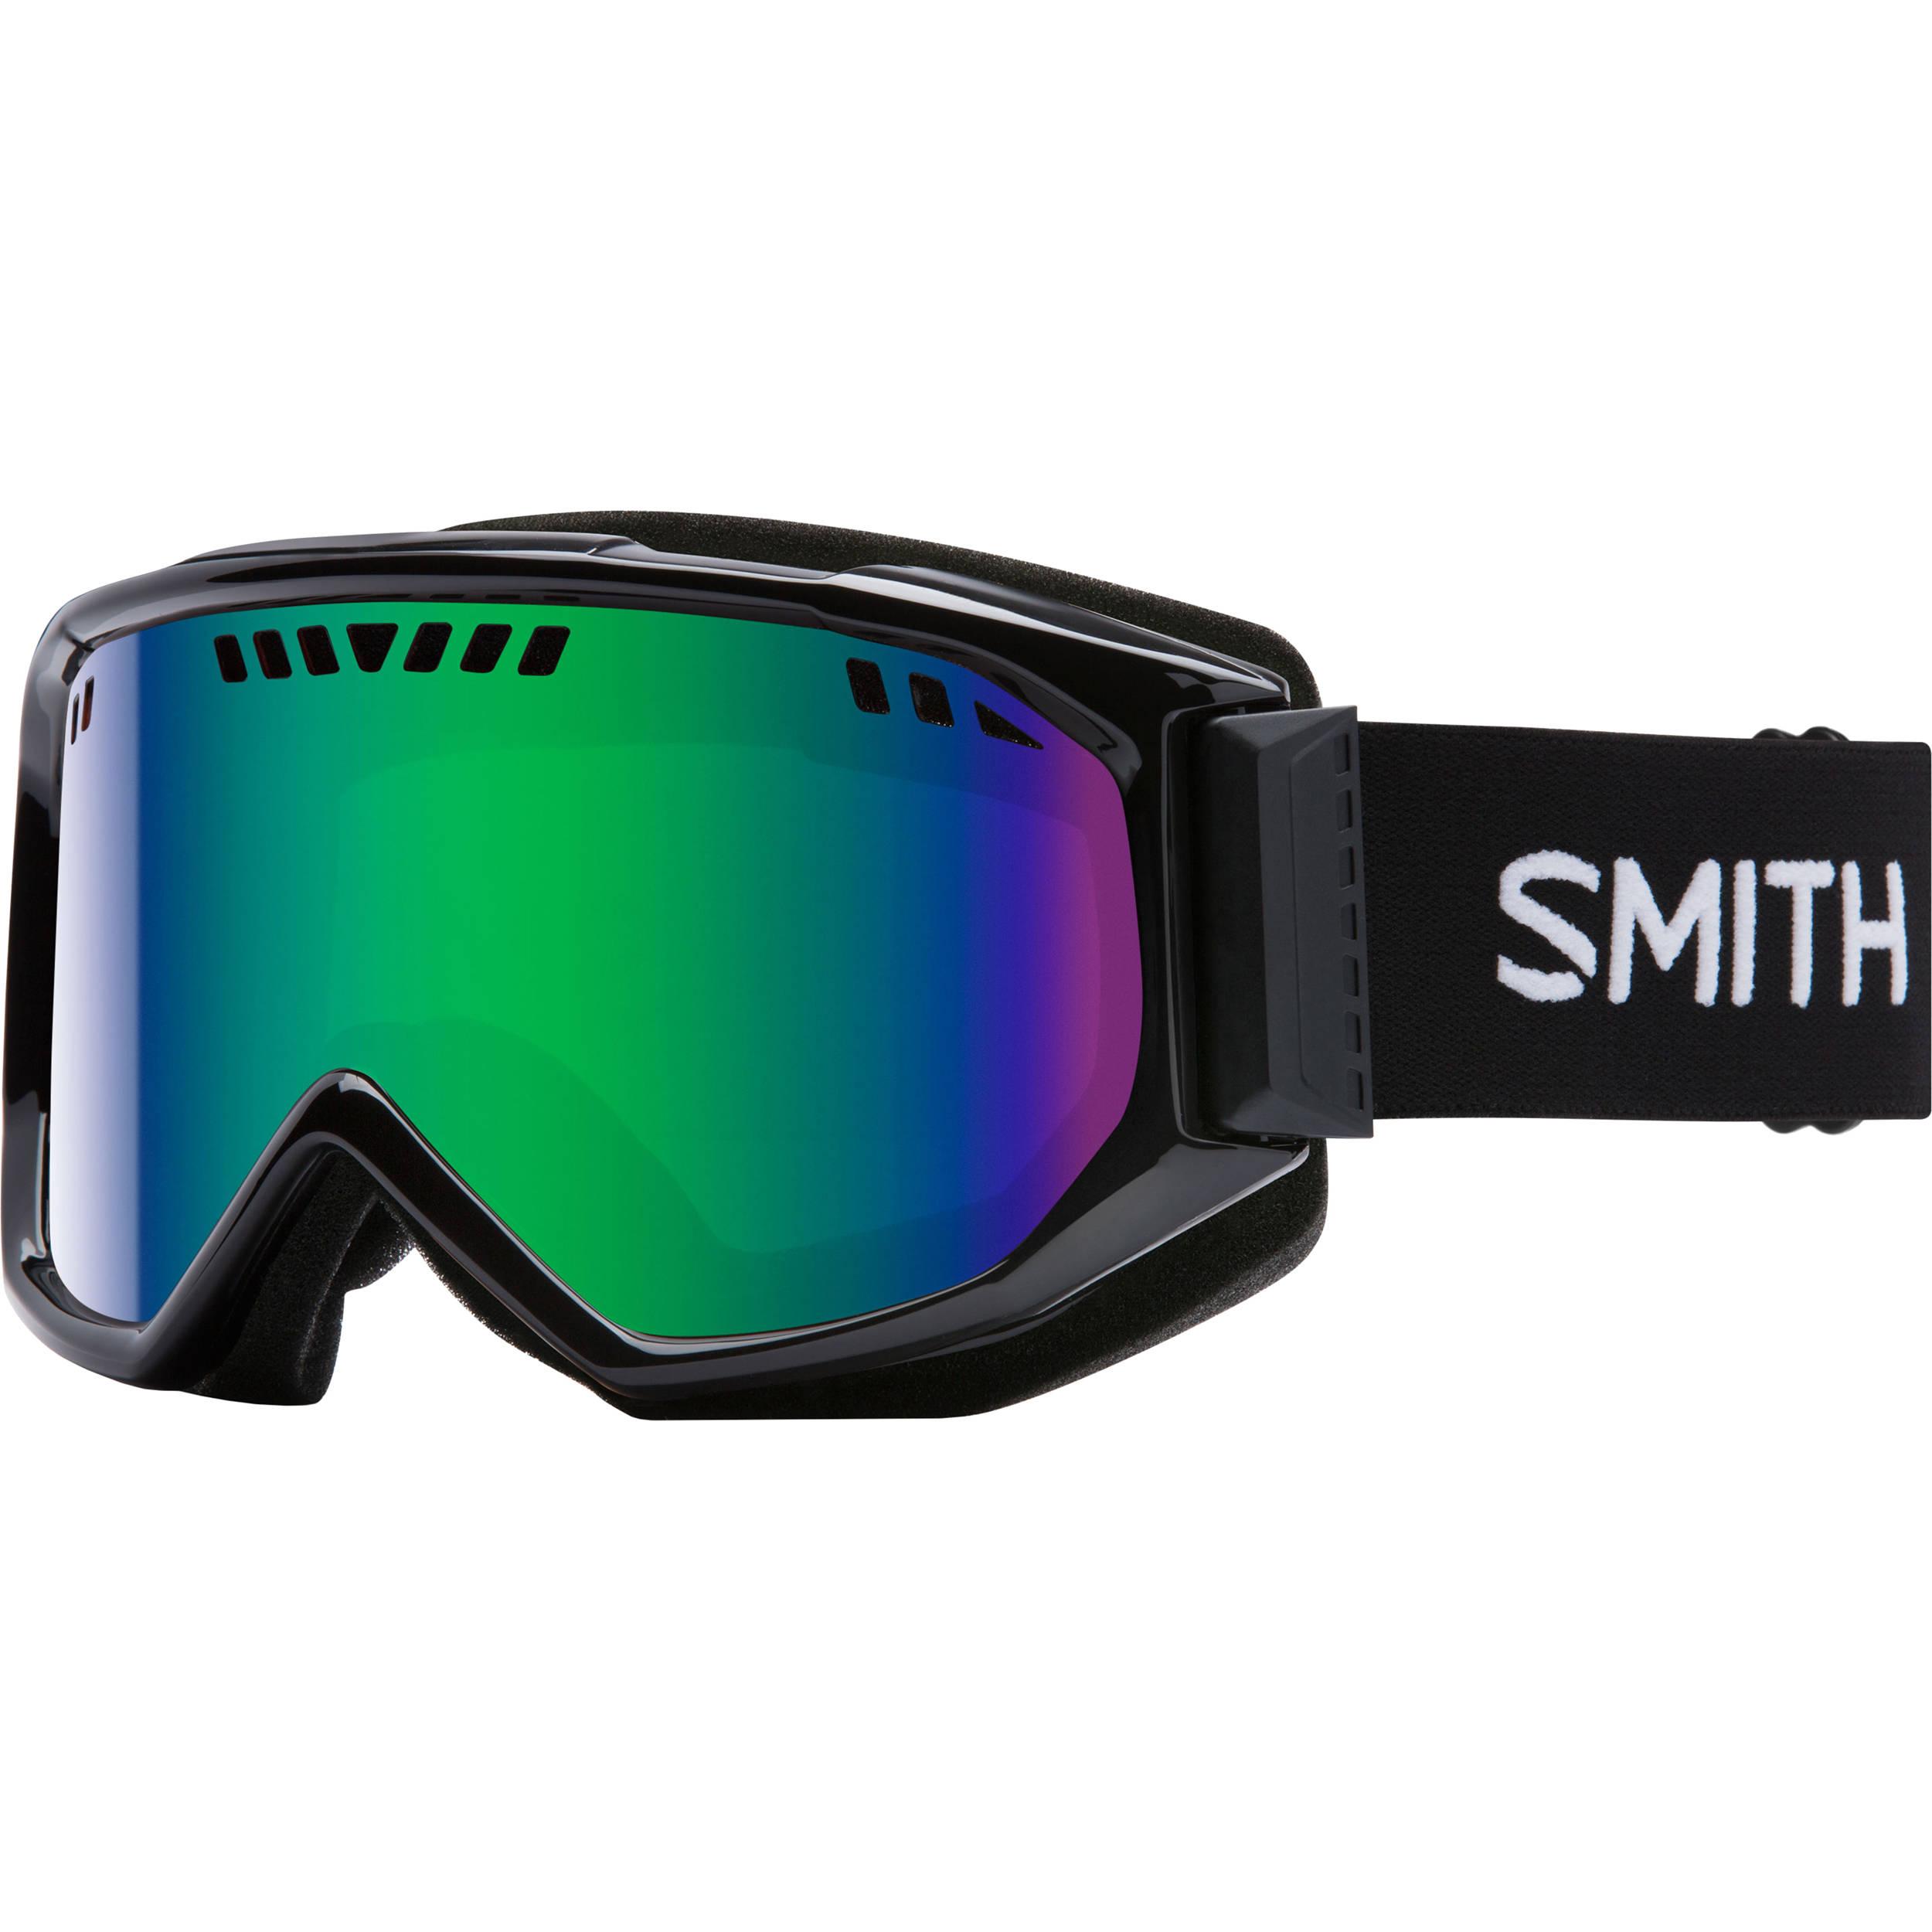 d91b2a1186a5 Smith Optics Medium-Fit Scope Snow Goggle SC3NXBK16 B H Photo